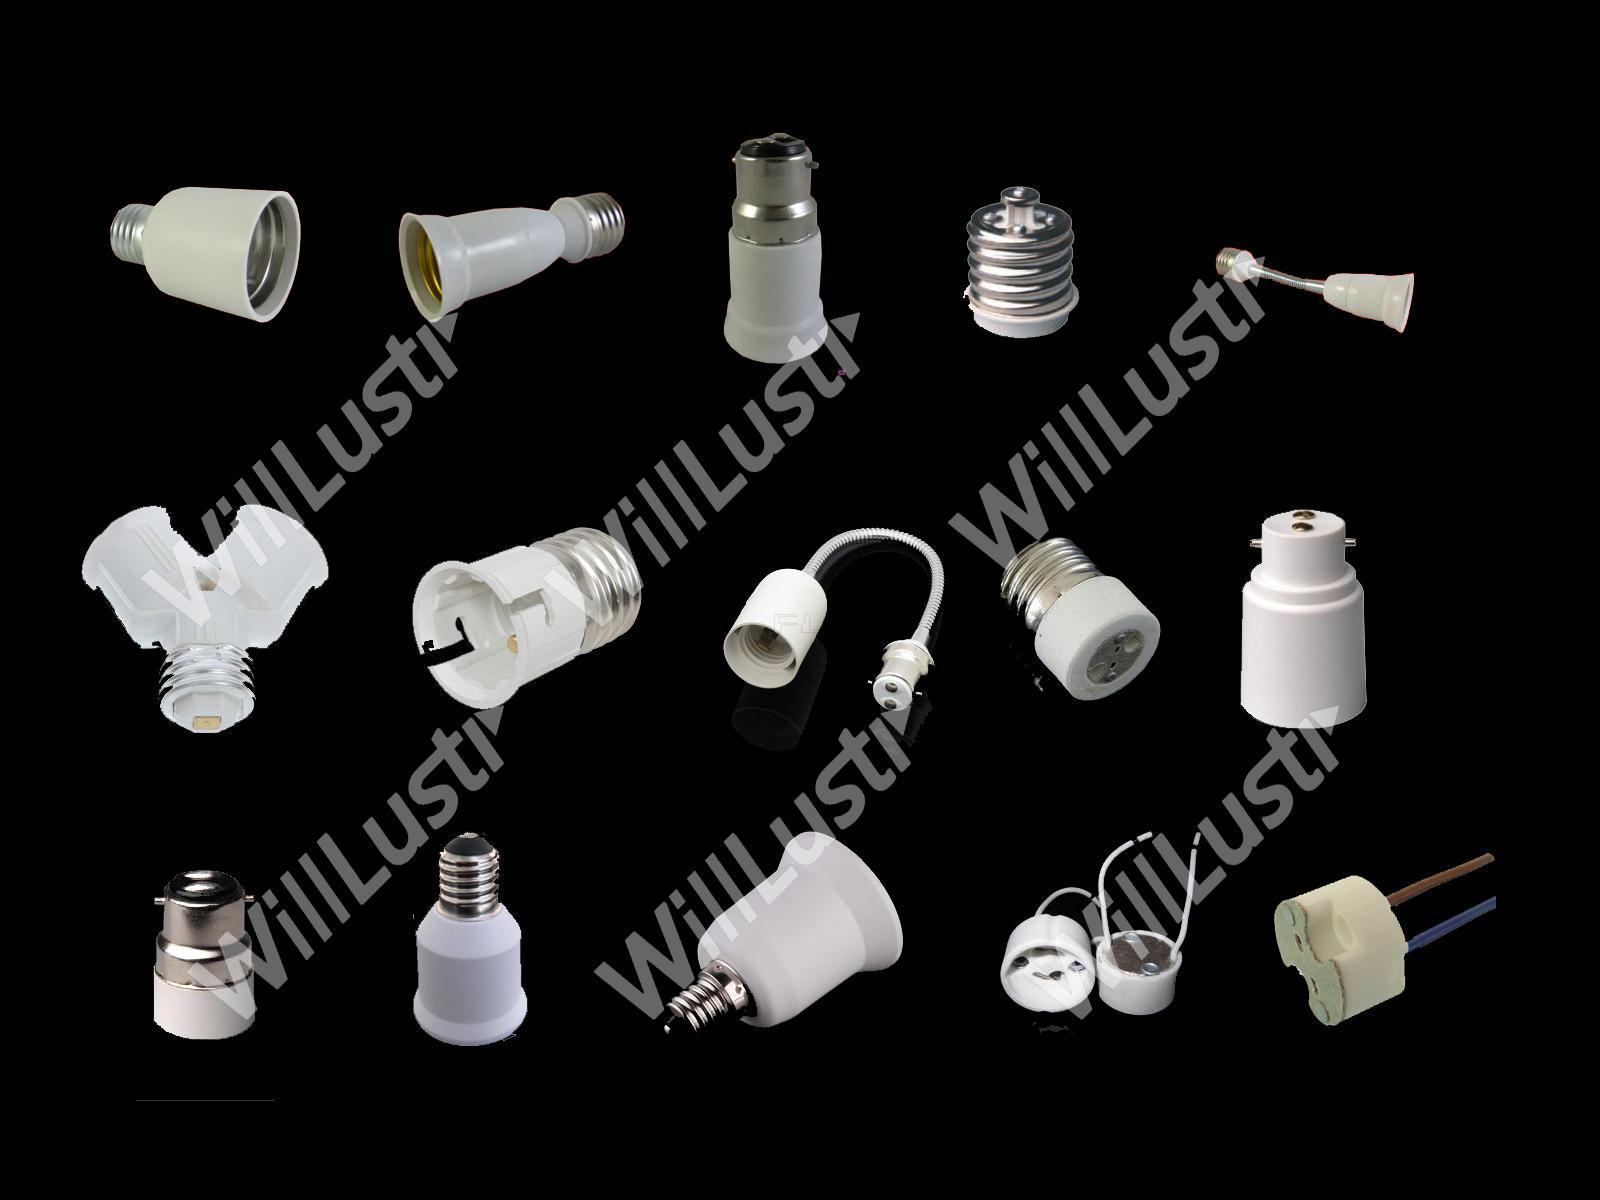 E27 to E27 Extension Converter Adapter Led Halogen CFL light bulb lamp E27 extension adapter